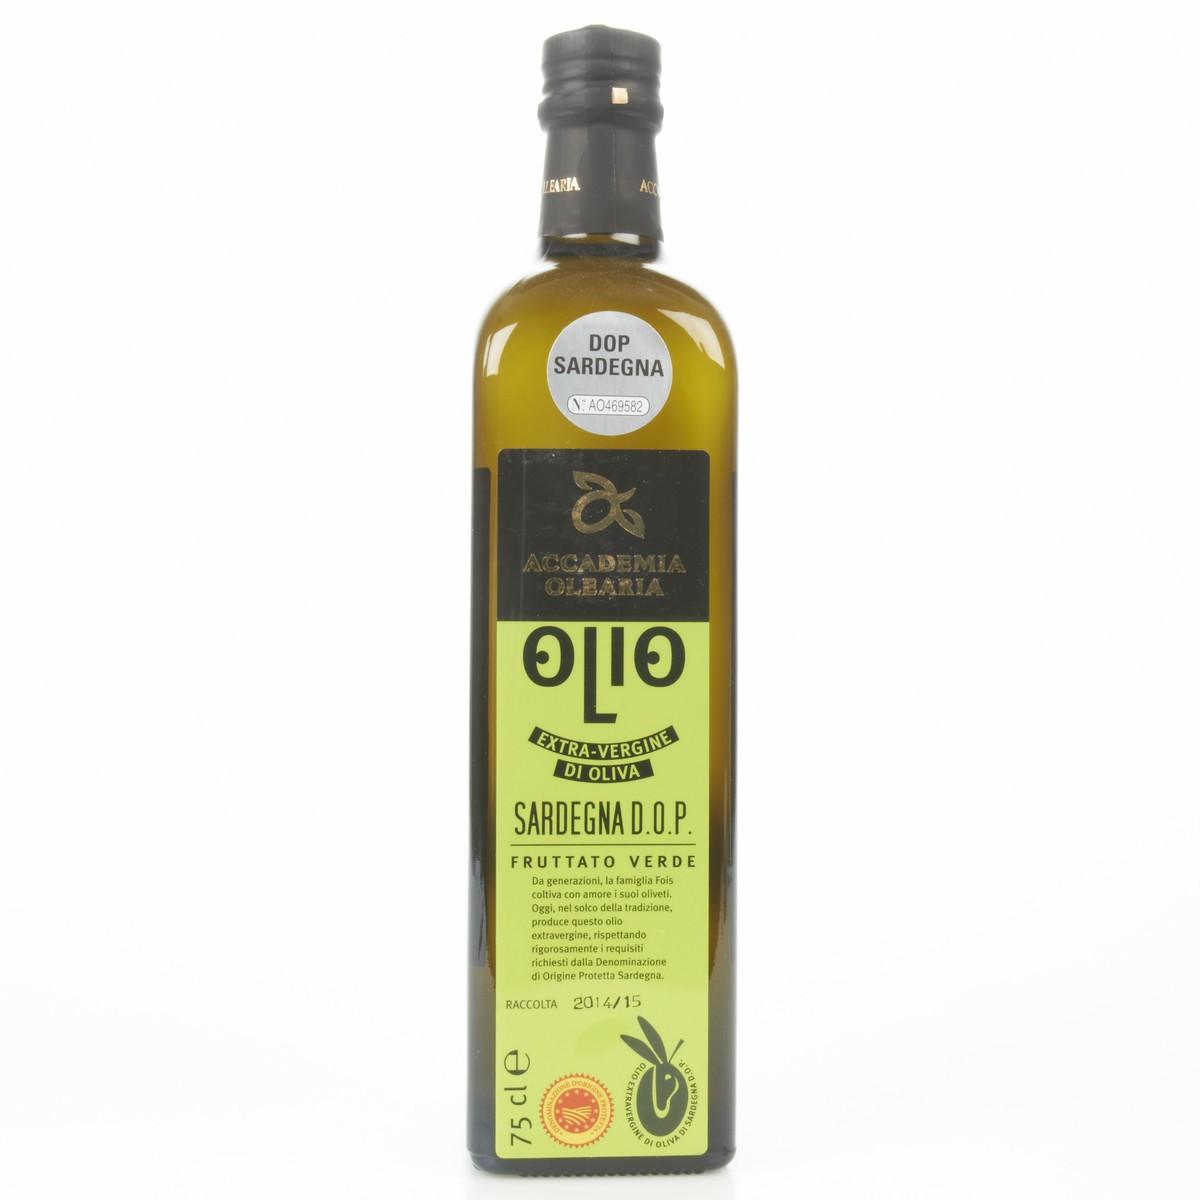 Accademia Olearia Olio extravergine d'oliva fruttato DOP